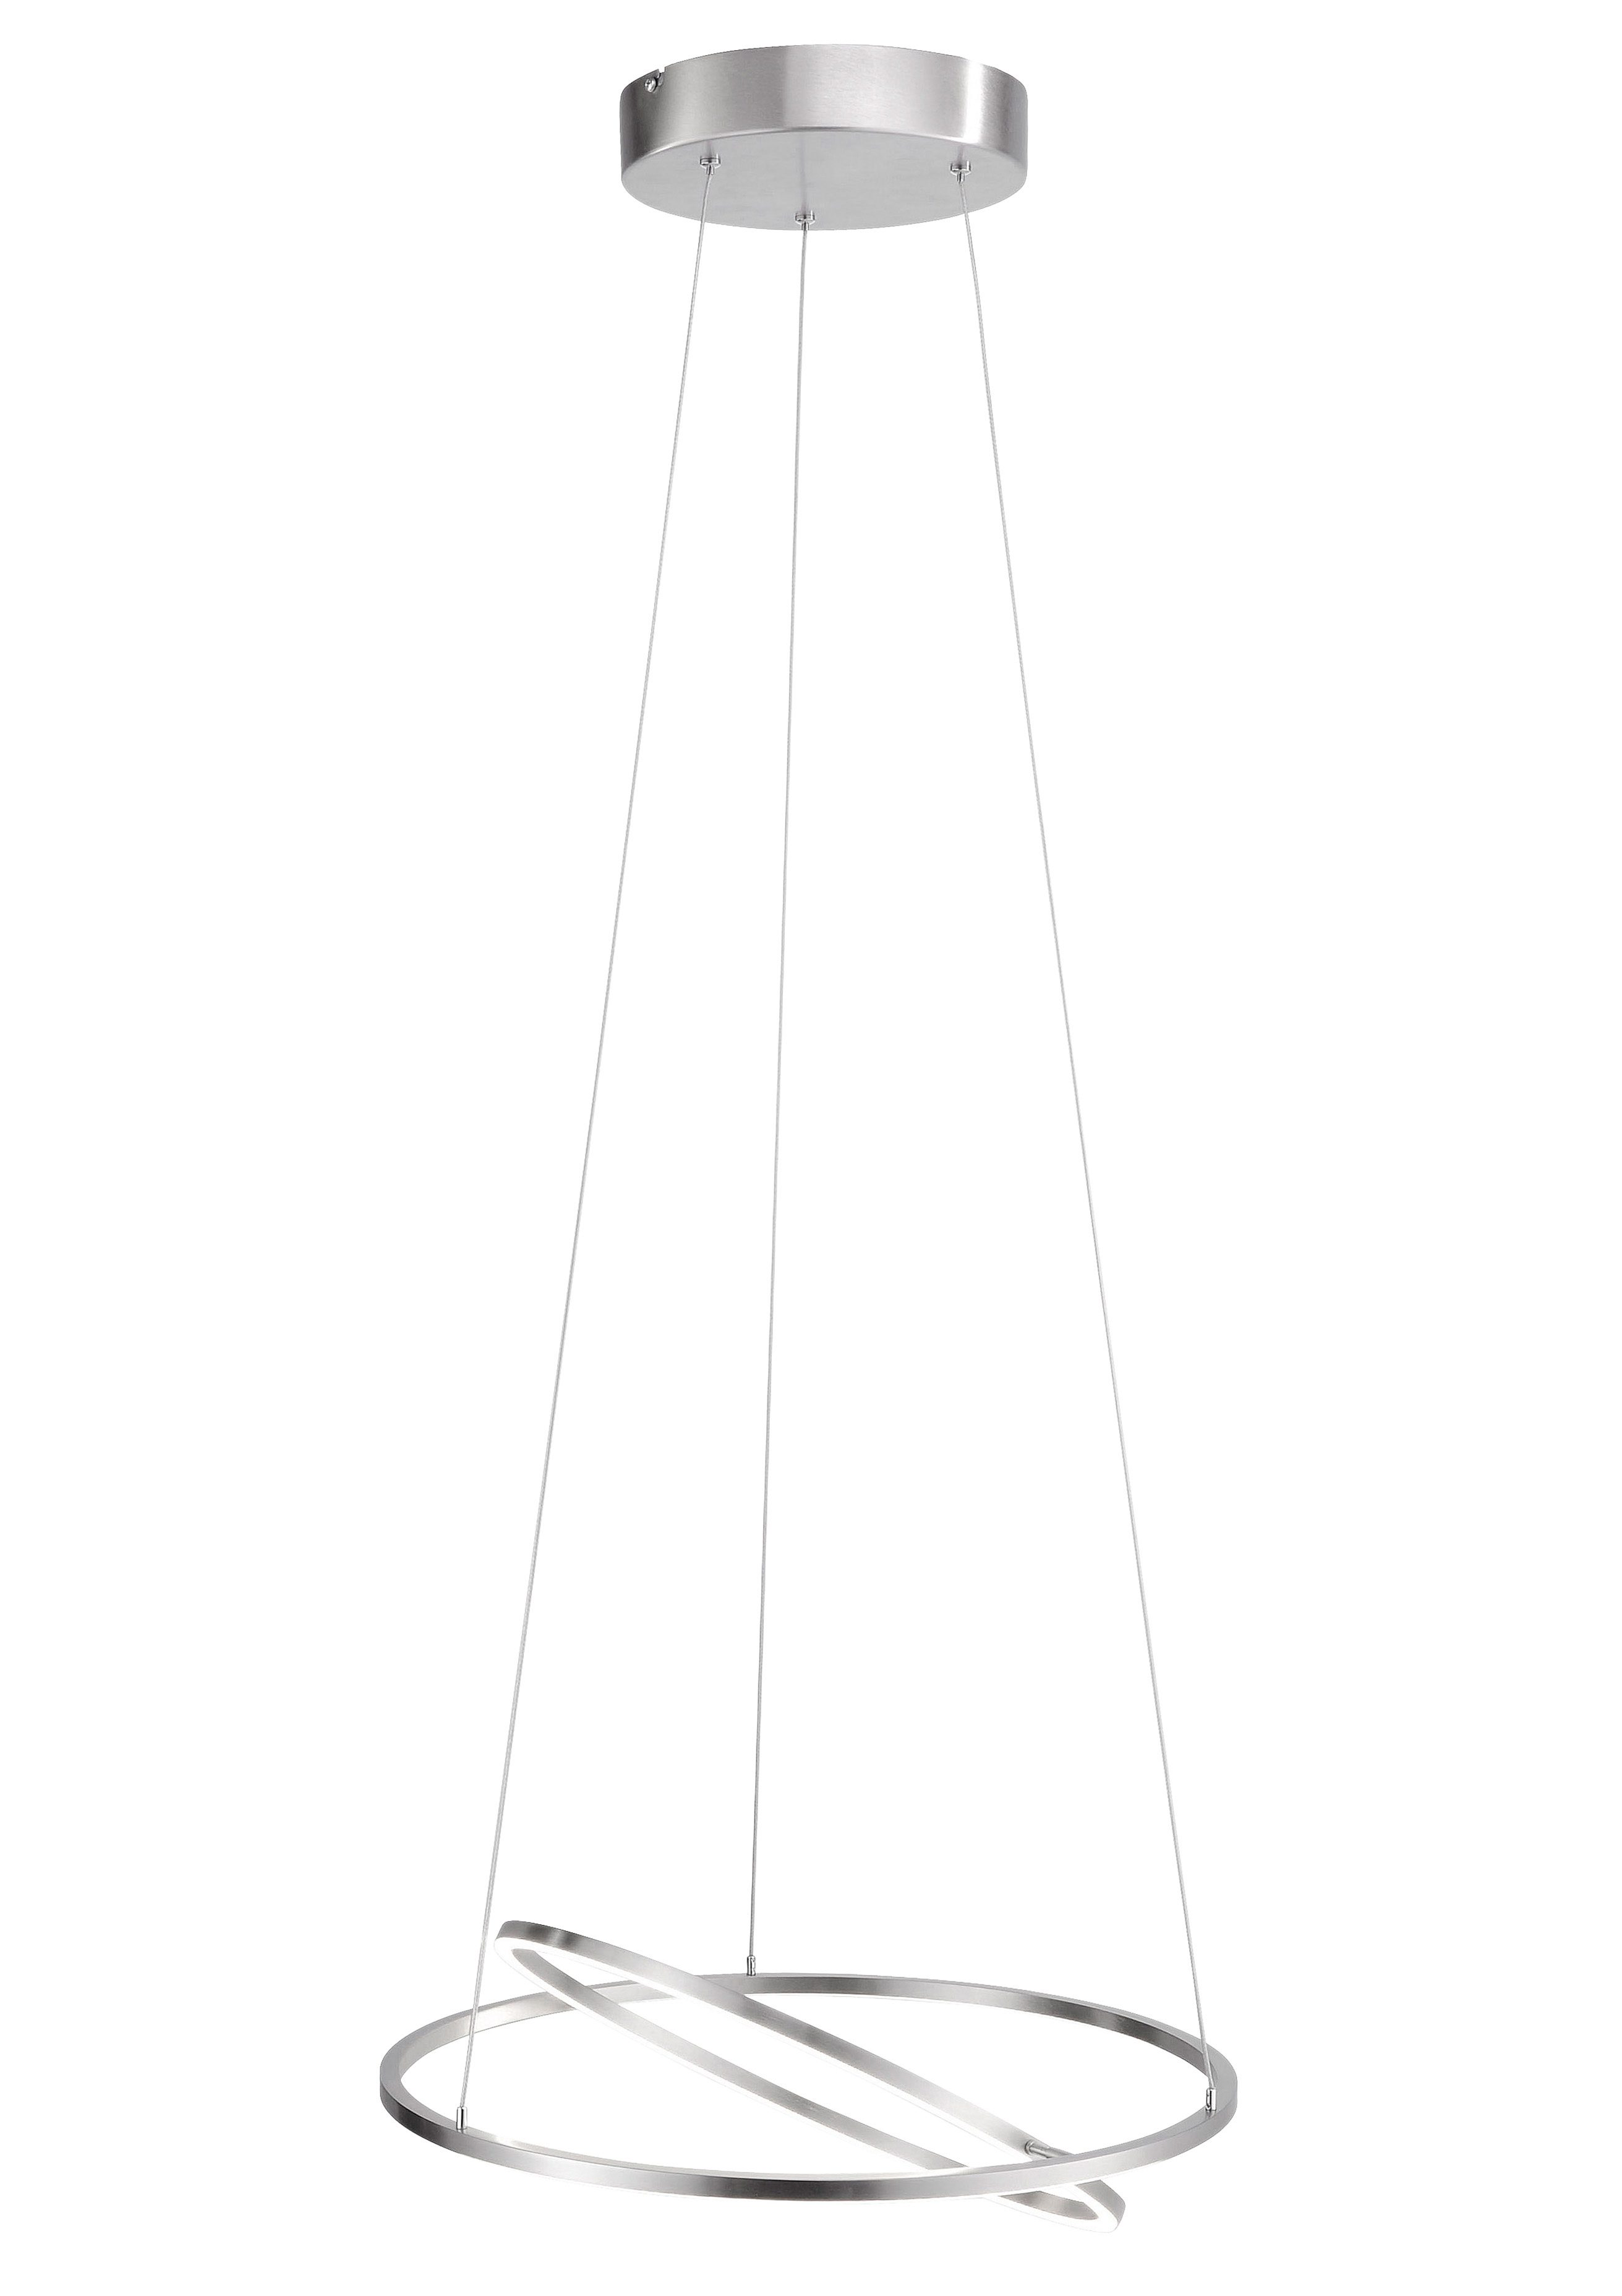 Paul Neuhaus LED Pendelleuchte »INIGO«, 2-flammig